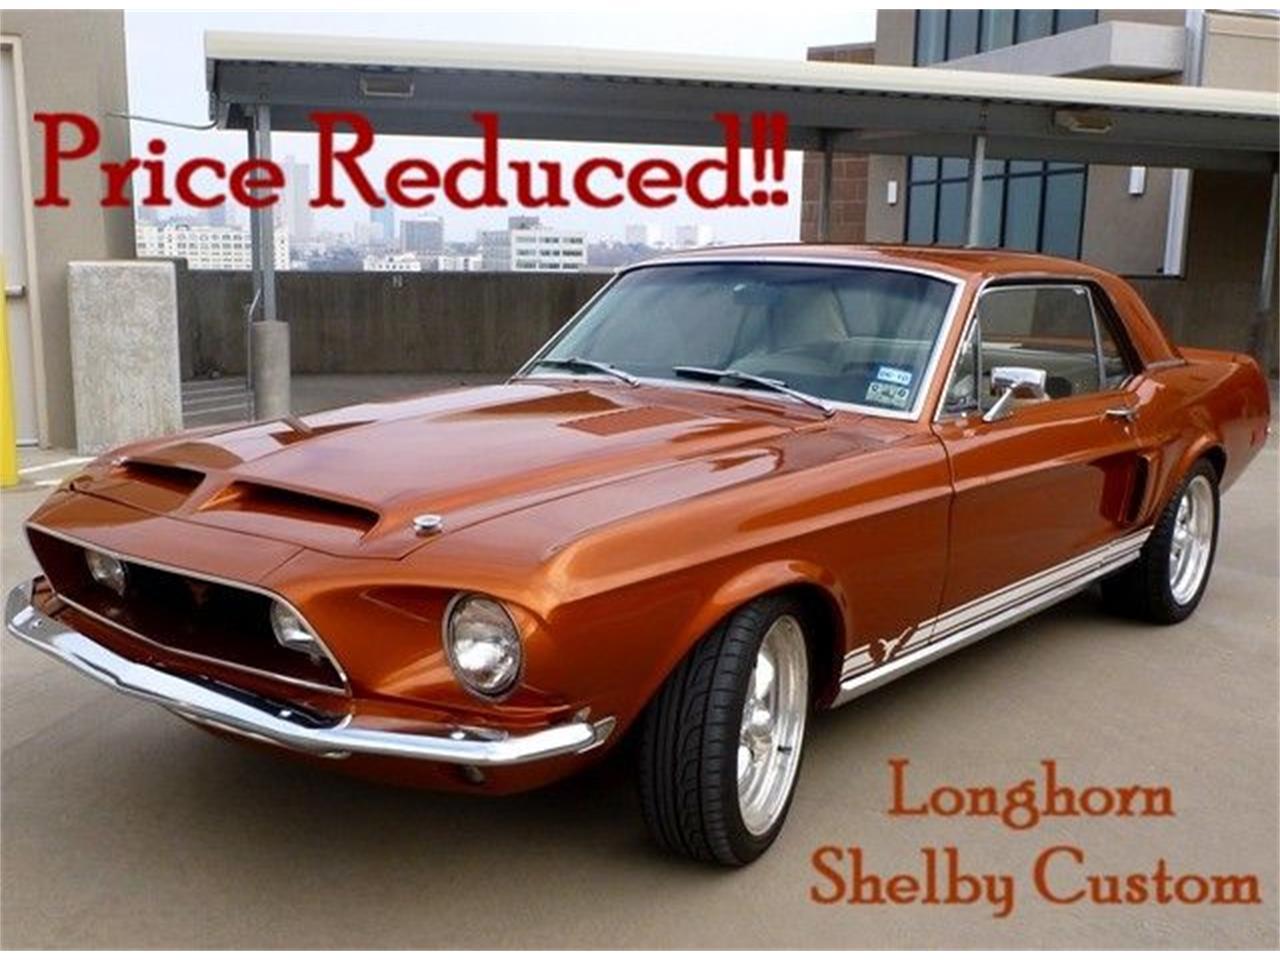 For Sale: 1968 Ford MUSTANG LONGHORN SHELBY CUSTOM in Arlington, Texas